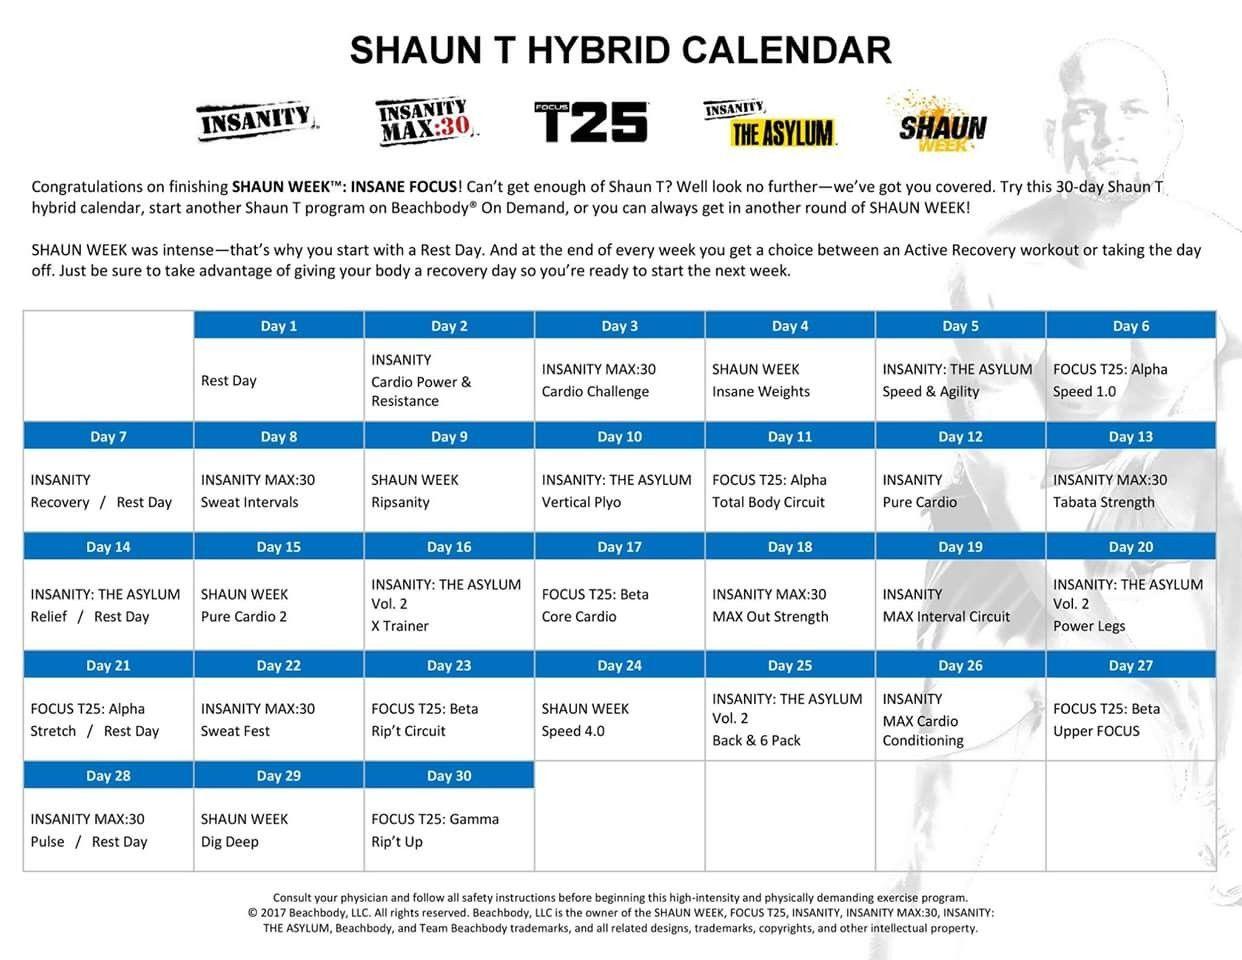 Shaun Week Monthly Calendar #2 Calendrier Hybride Mensuel